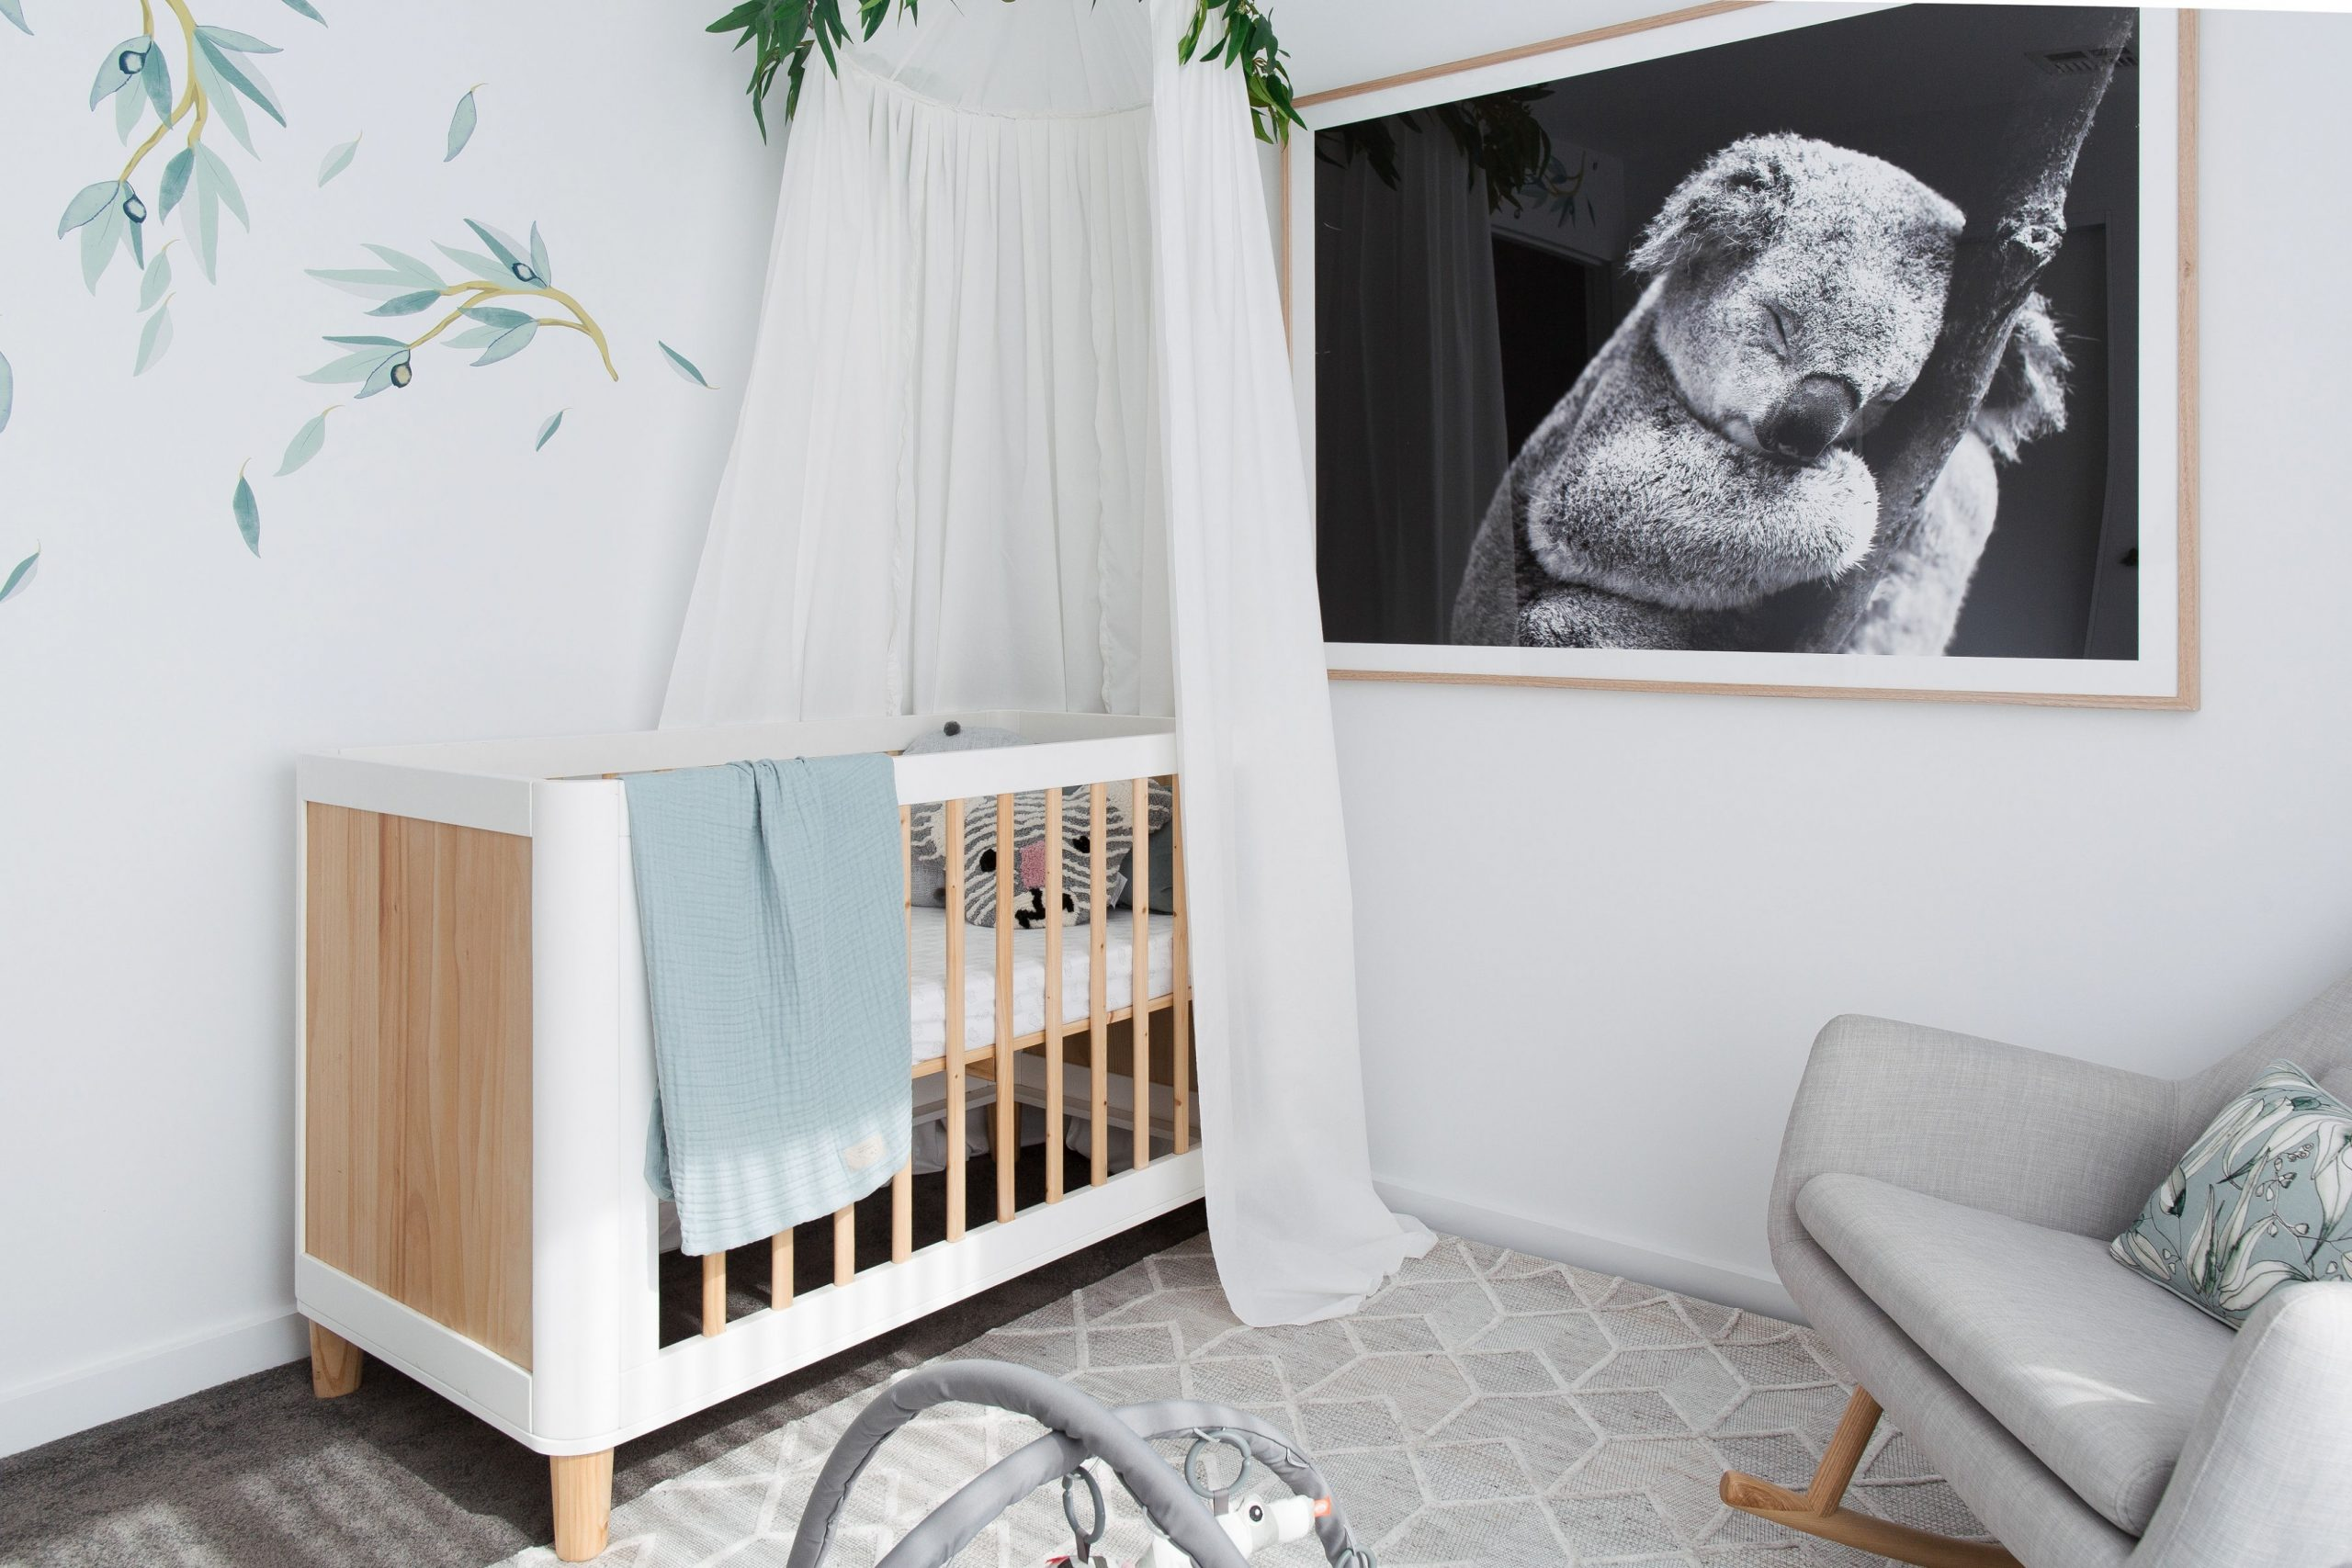 DIY nursery canopy with eucalyptus garland - Style Curator - Baby Room Garland